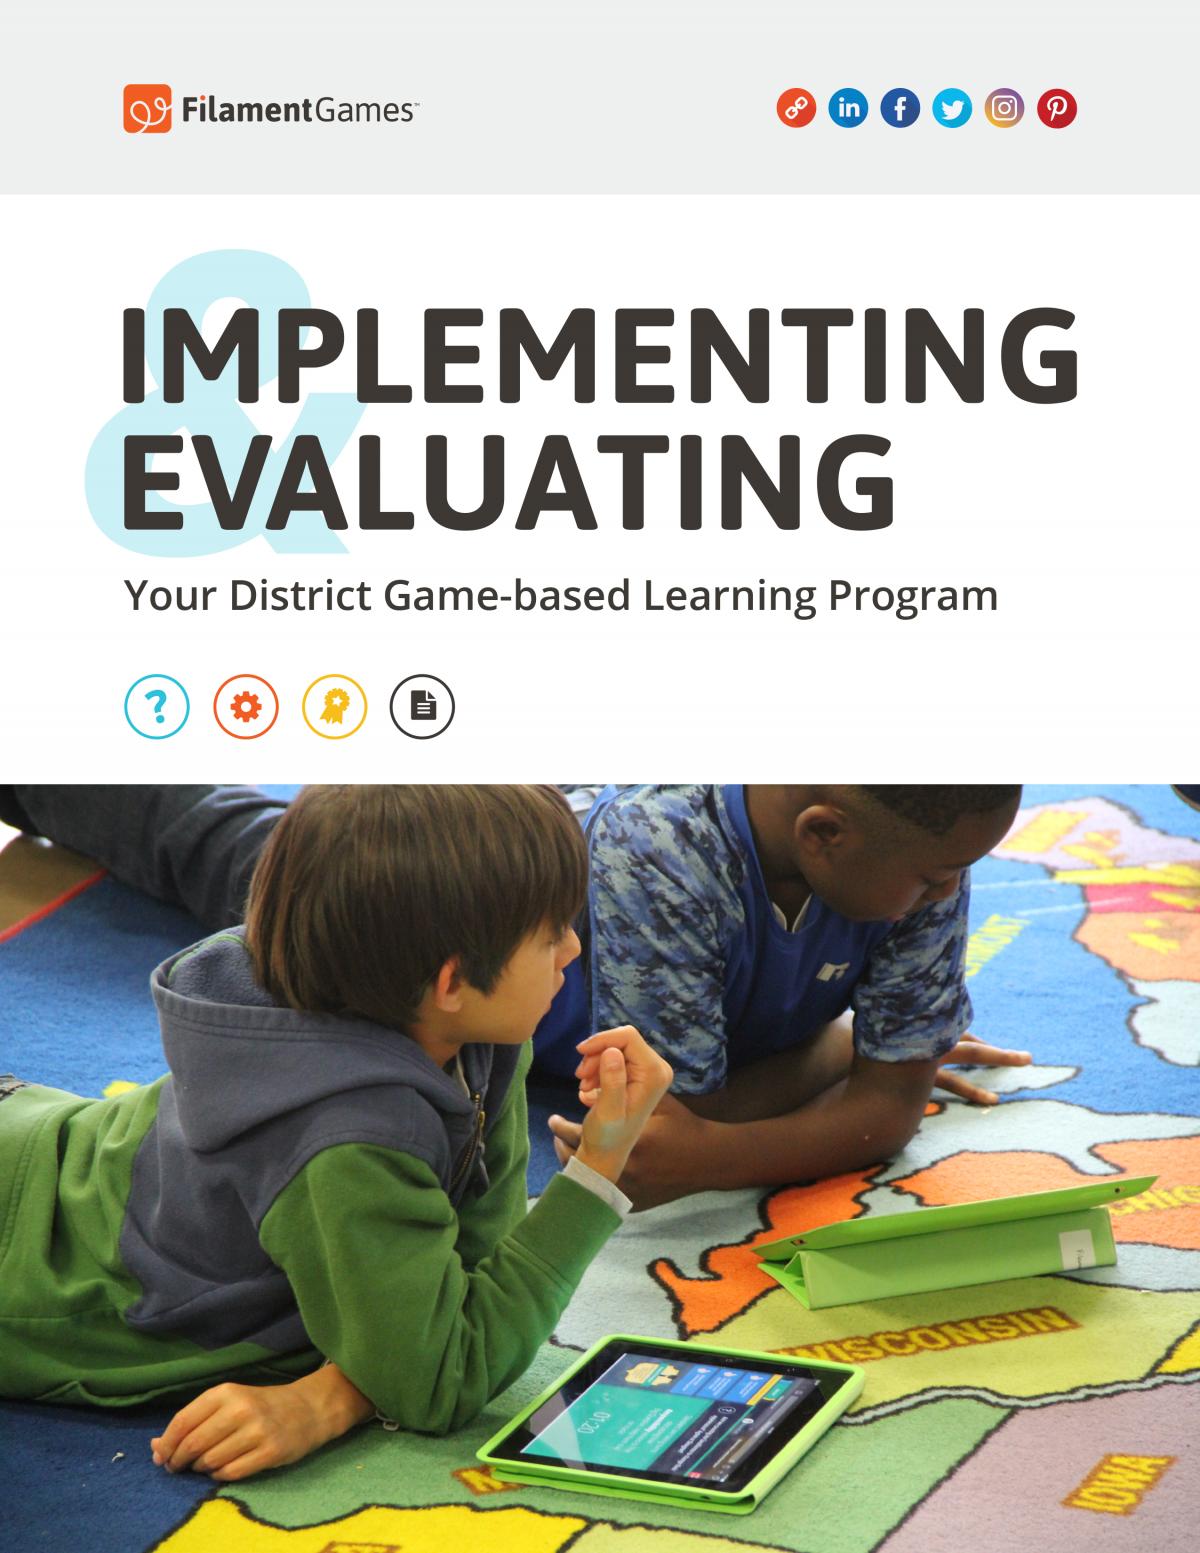 Filament Games District Implementation Guide